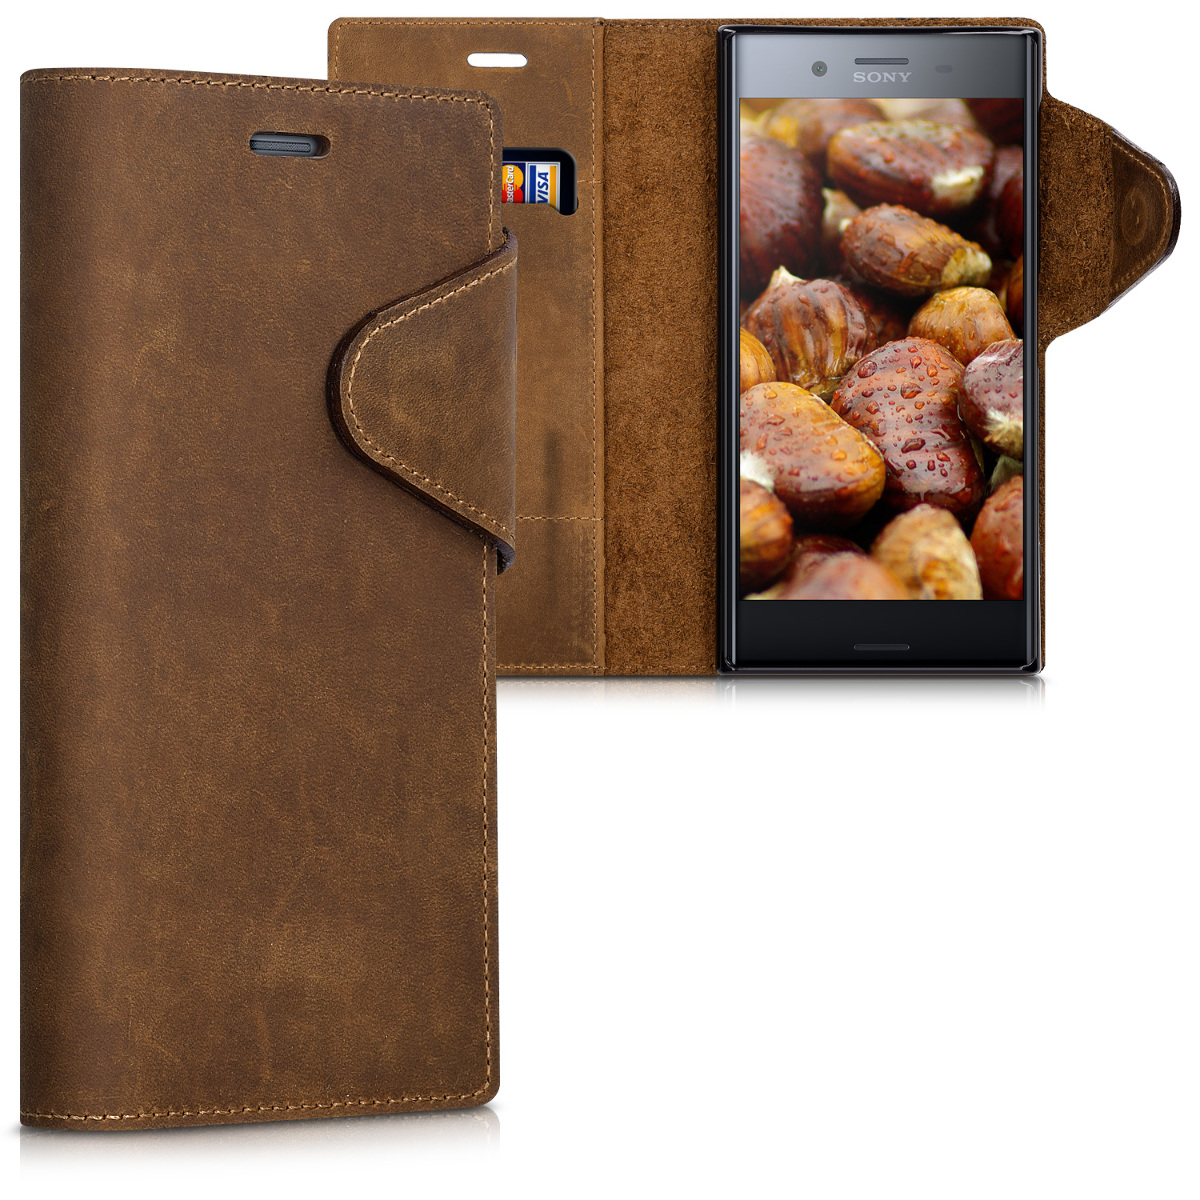 Kalibri Δερμάτινη Suede Θήκη - Πορτοφόλι Sony Xperia XZ Premium -  Brown (42942.05)